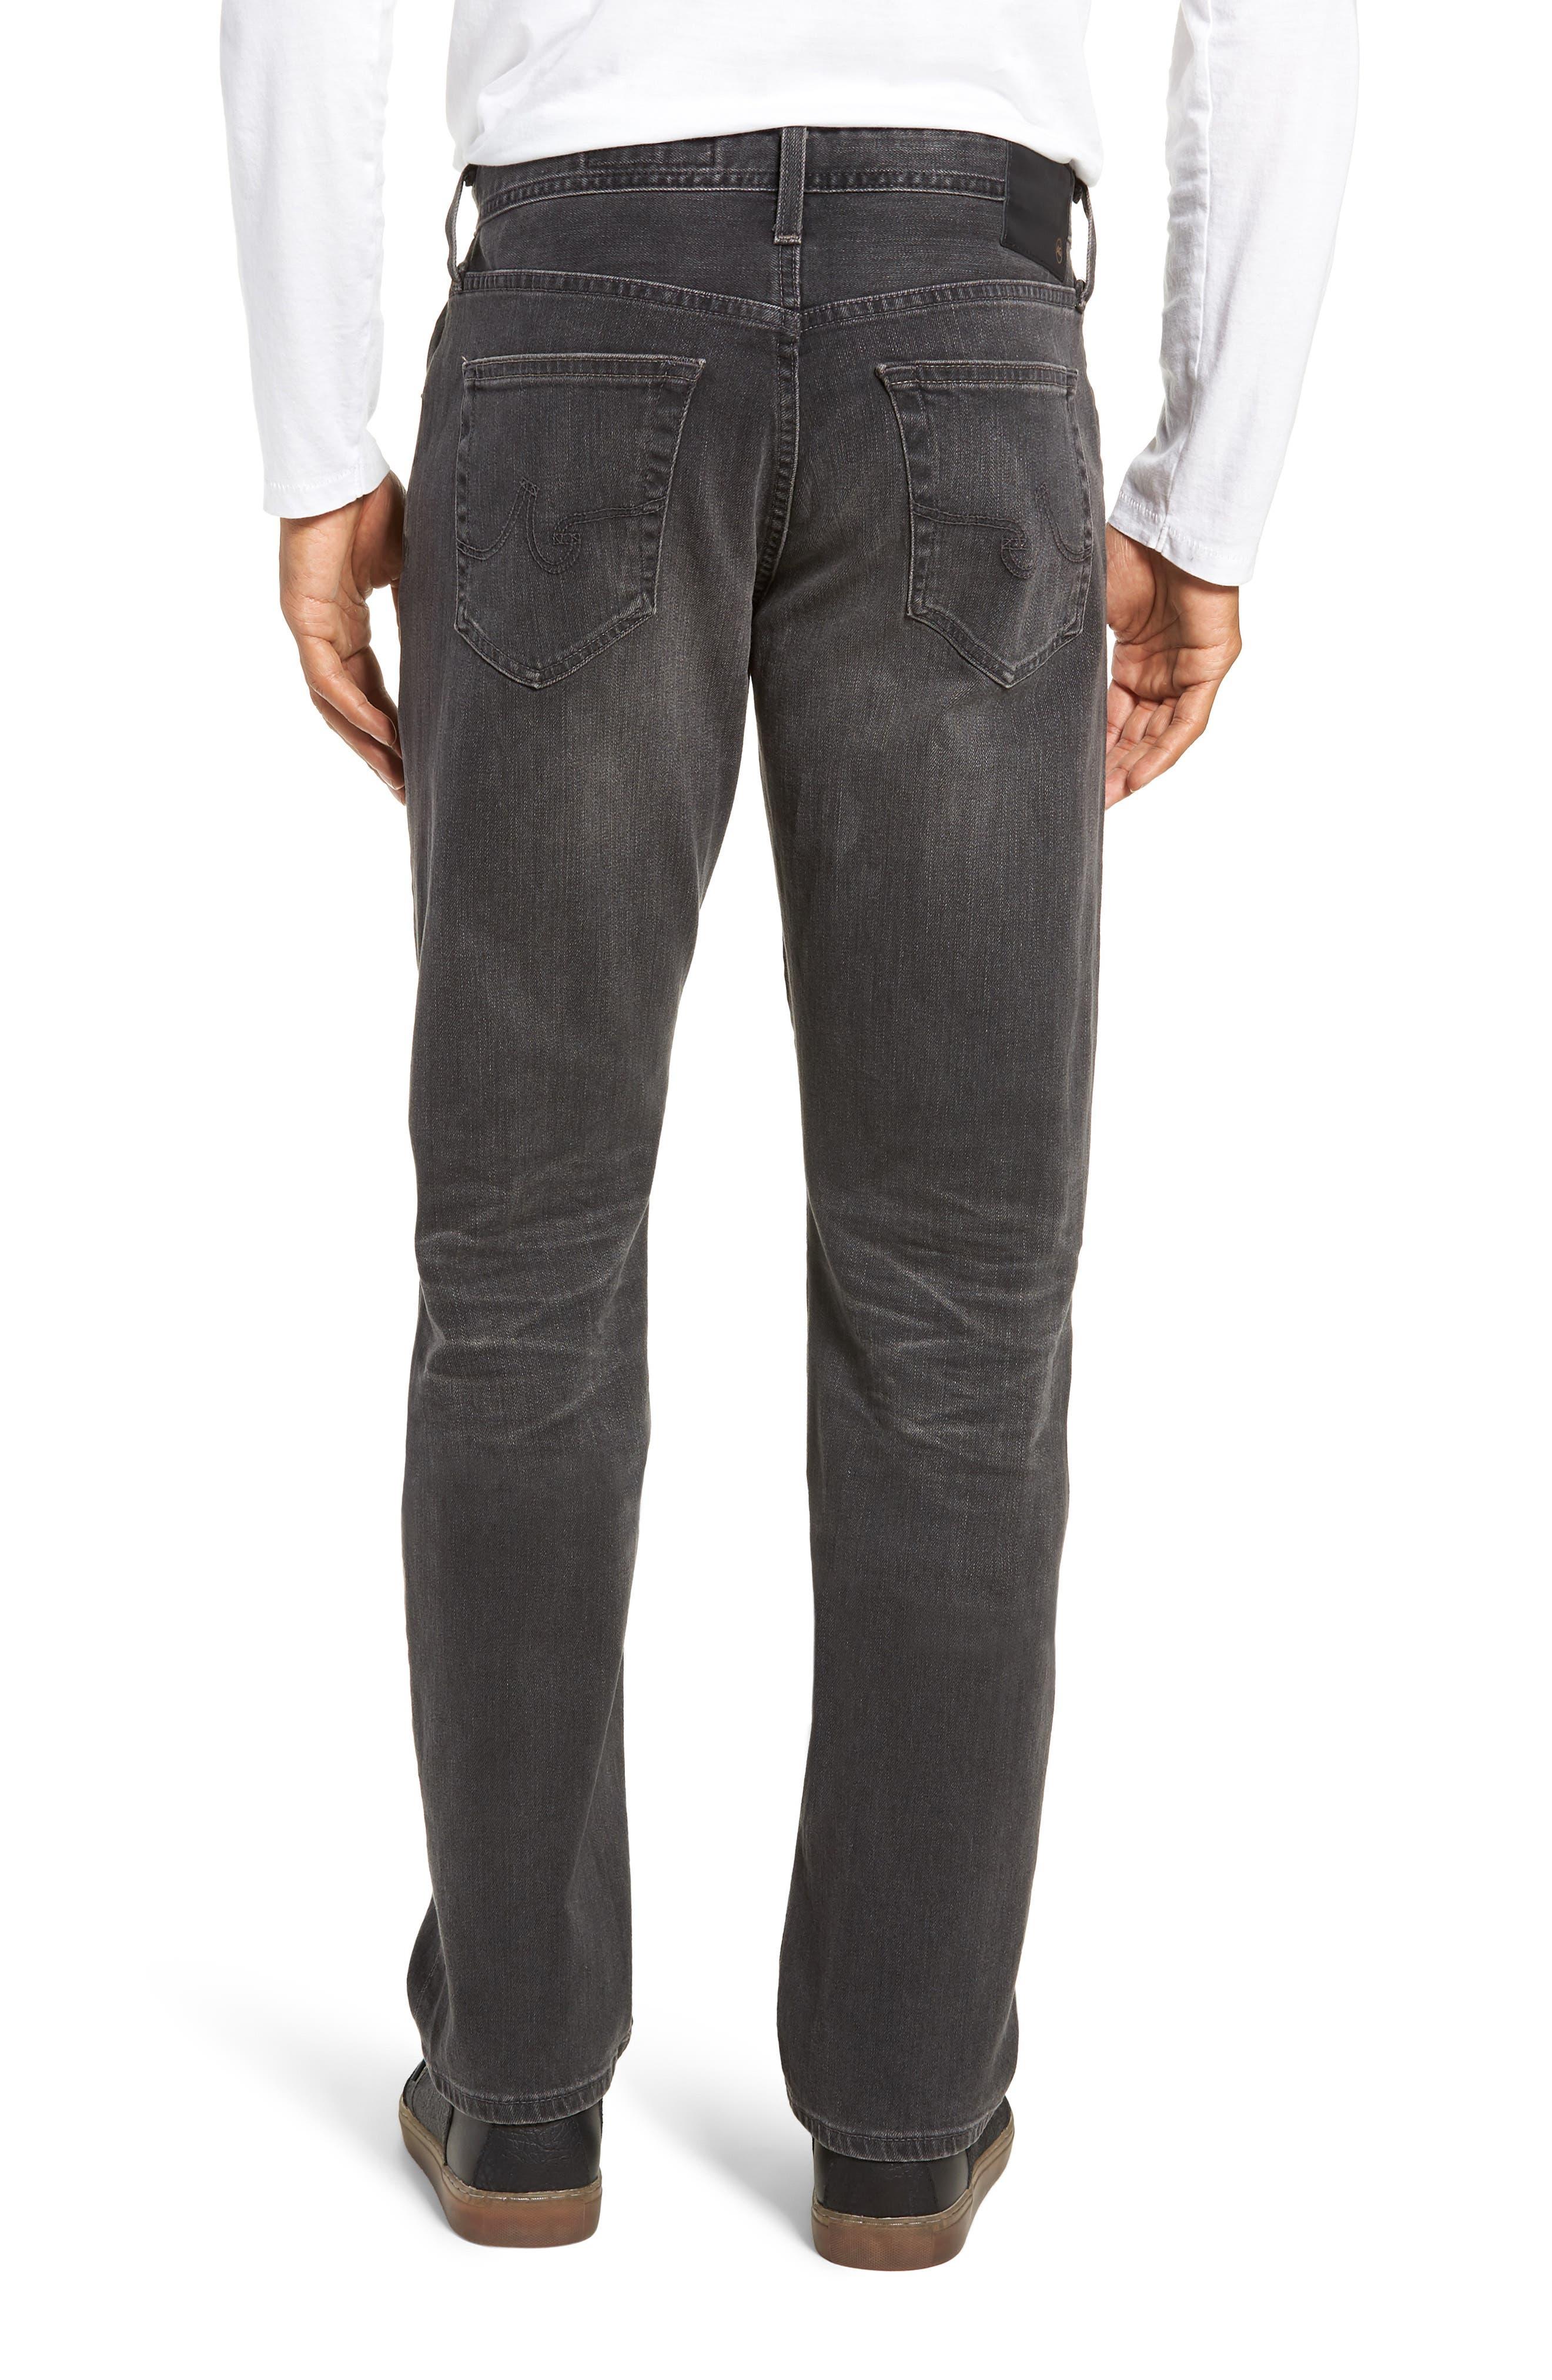 Graduate Slim Straight Leg Jeans,                             Alternate thumbnail 2, color,                             6 YEARS ARCADE